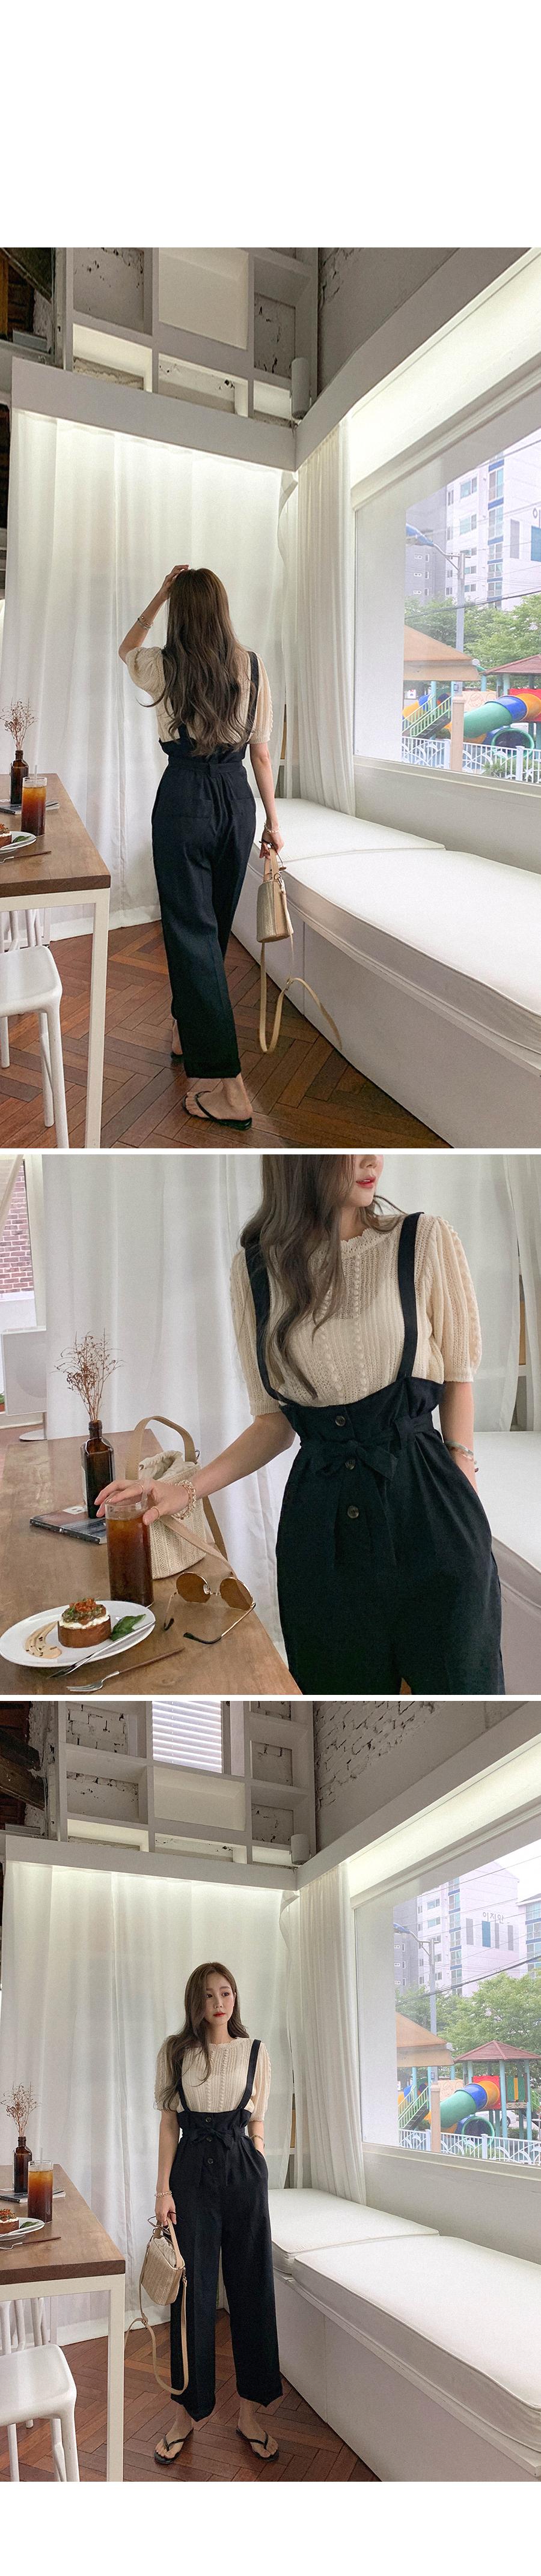 Fashionable silhouette button suspenders